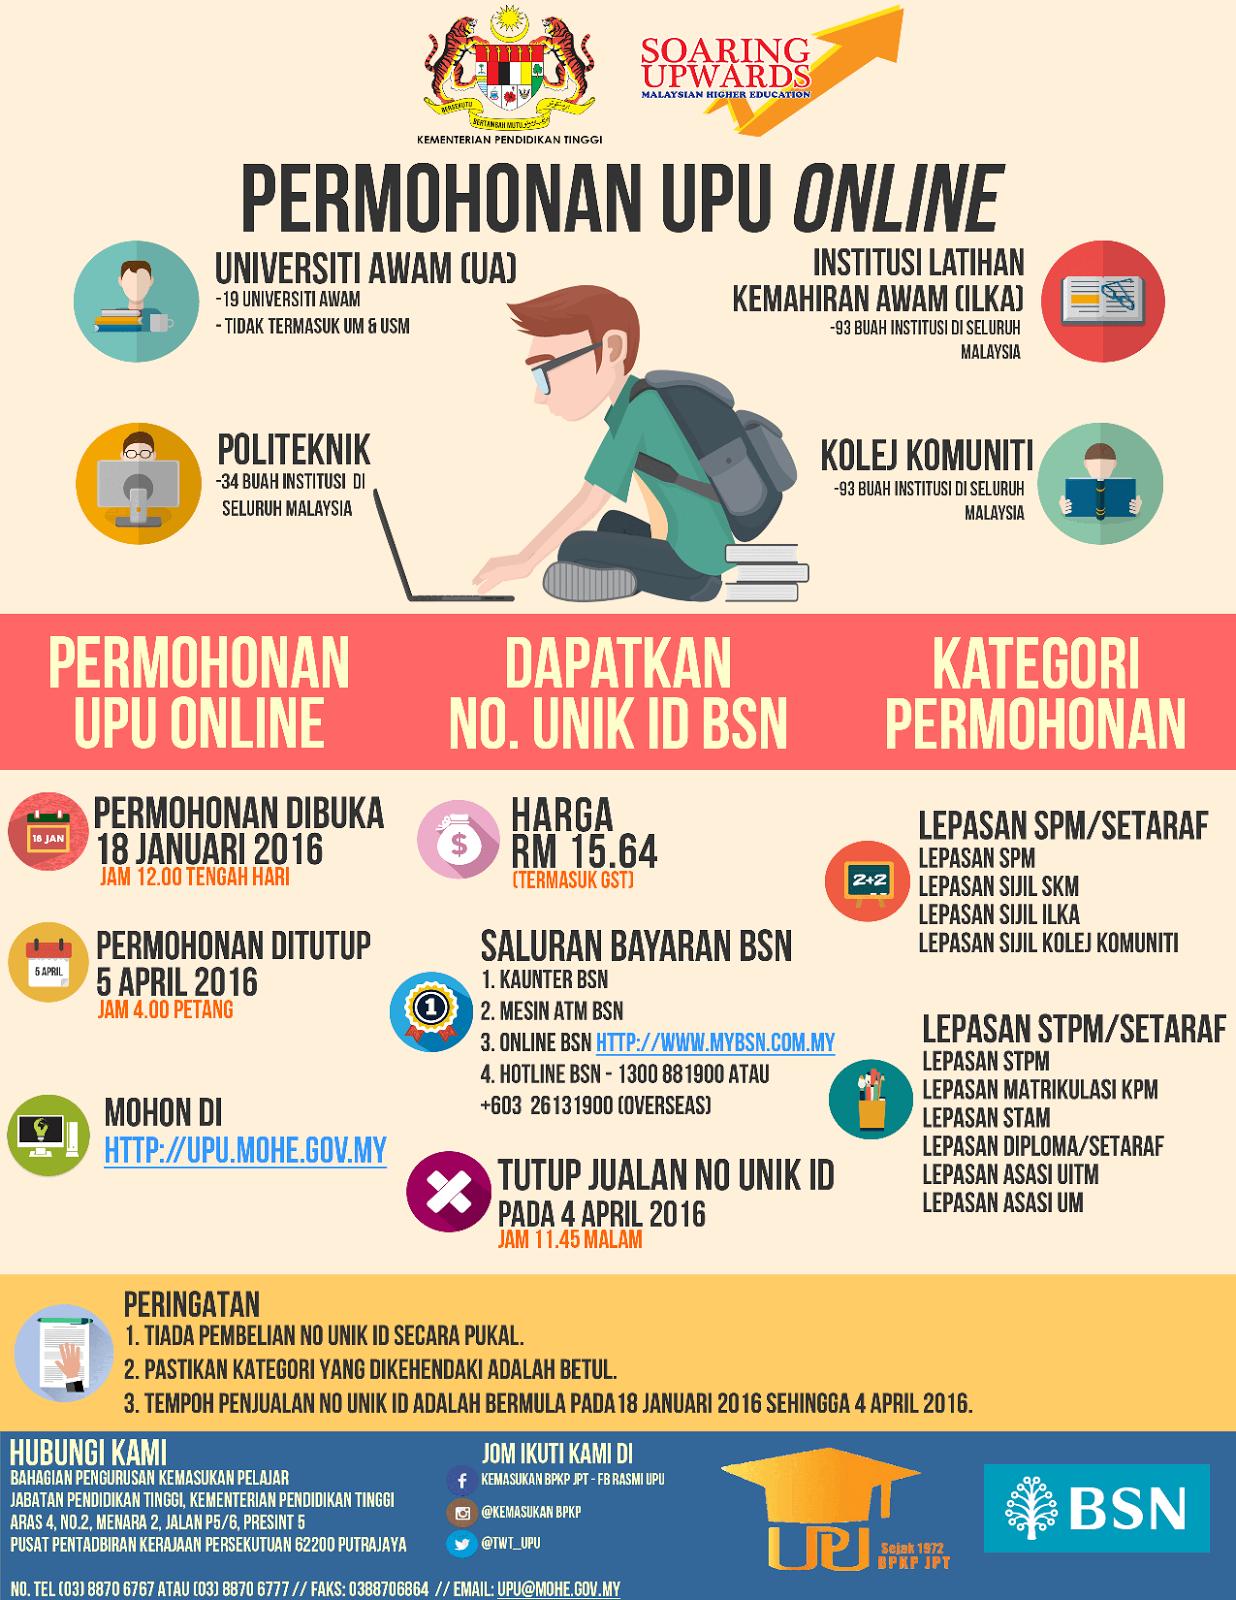 Kau Ilhamku Permohonan Upu Online Sesi 2016 2017